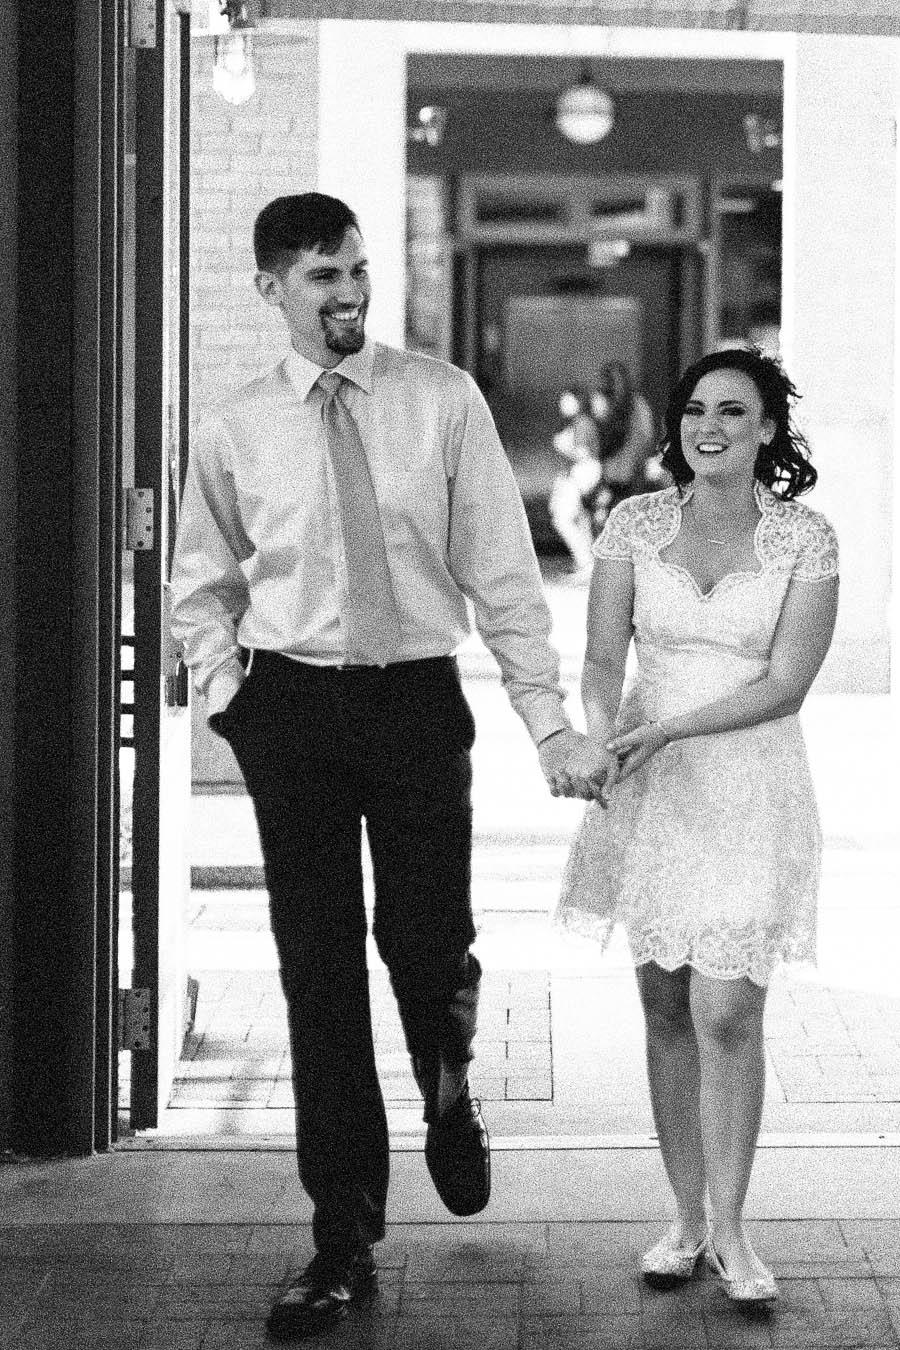 chattanooga film wedding photographer documentary natural gentle real life ©2016abigailbobophotography-46.jpg